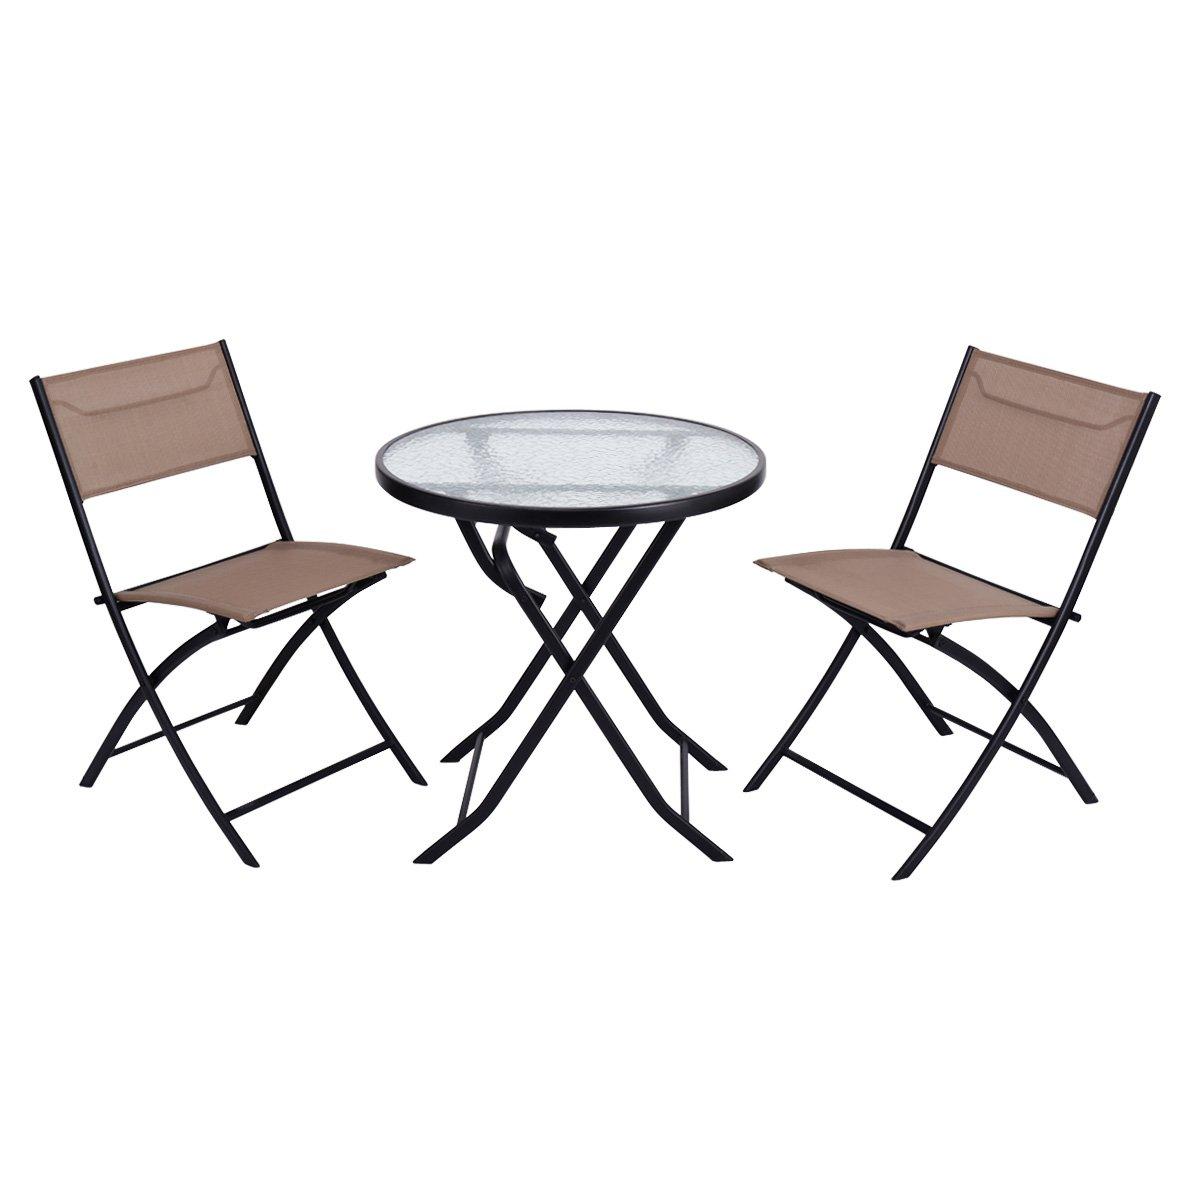 Giantex 3 Piece Table Chair Set Metal Tempered Glass Folding Outdoor Patio Garden Pool (Yellowish)